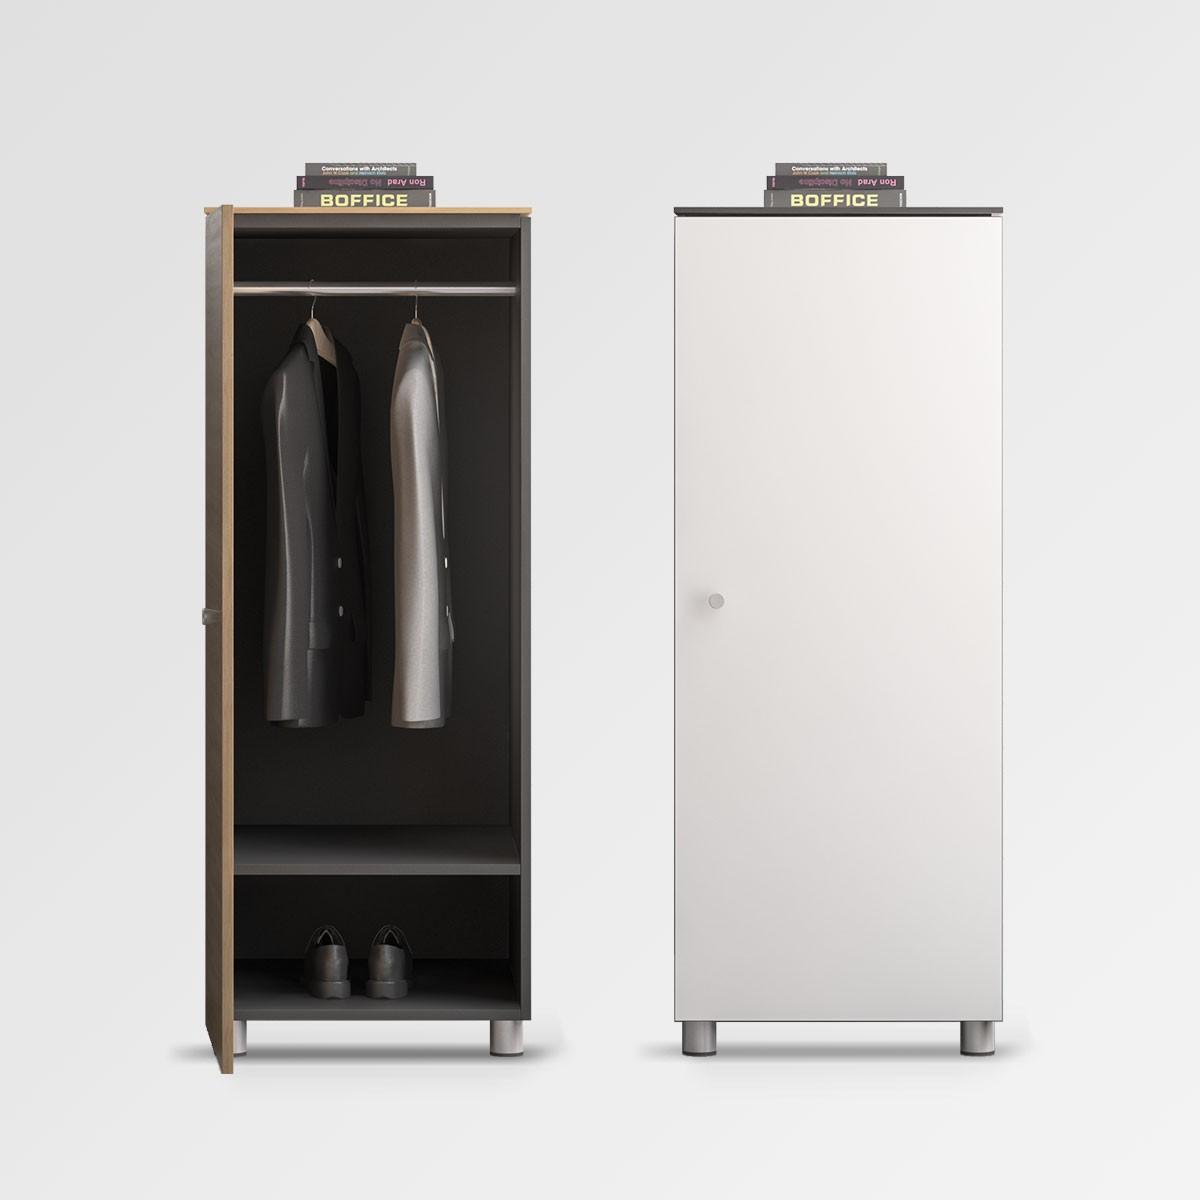 Office Storage Cabinets Wardrobe Decoraport Canada